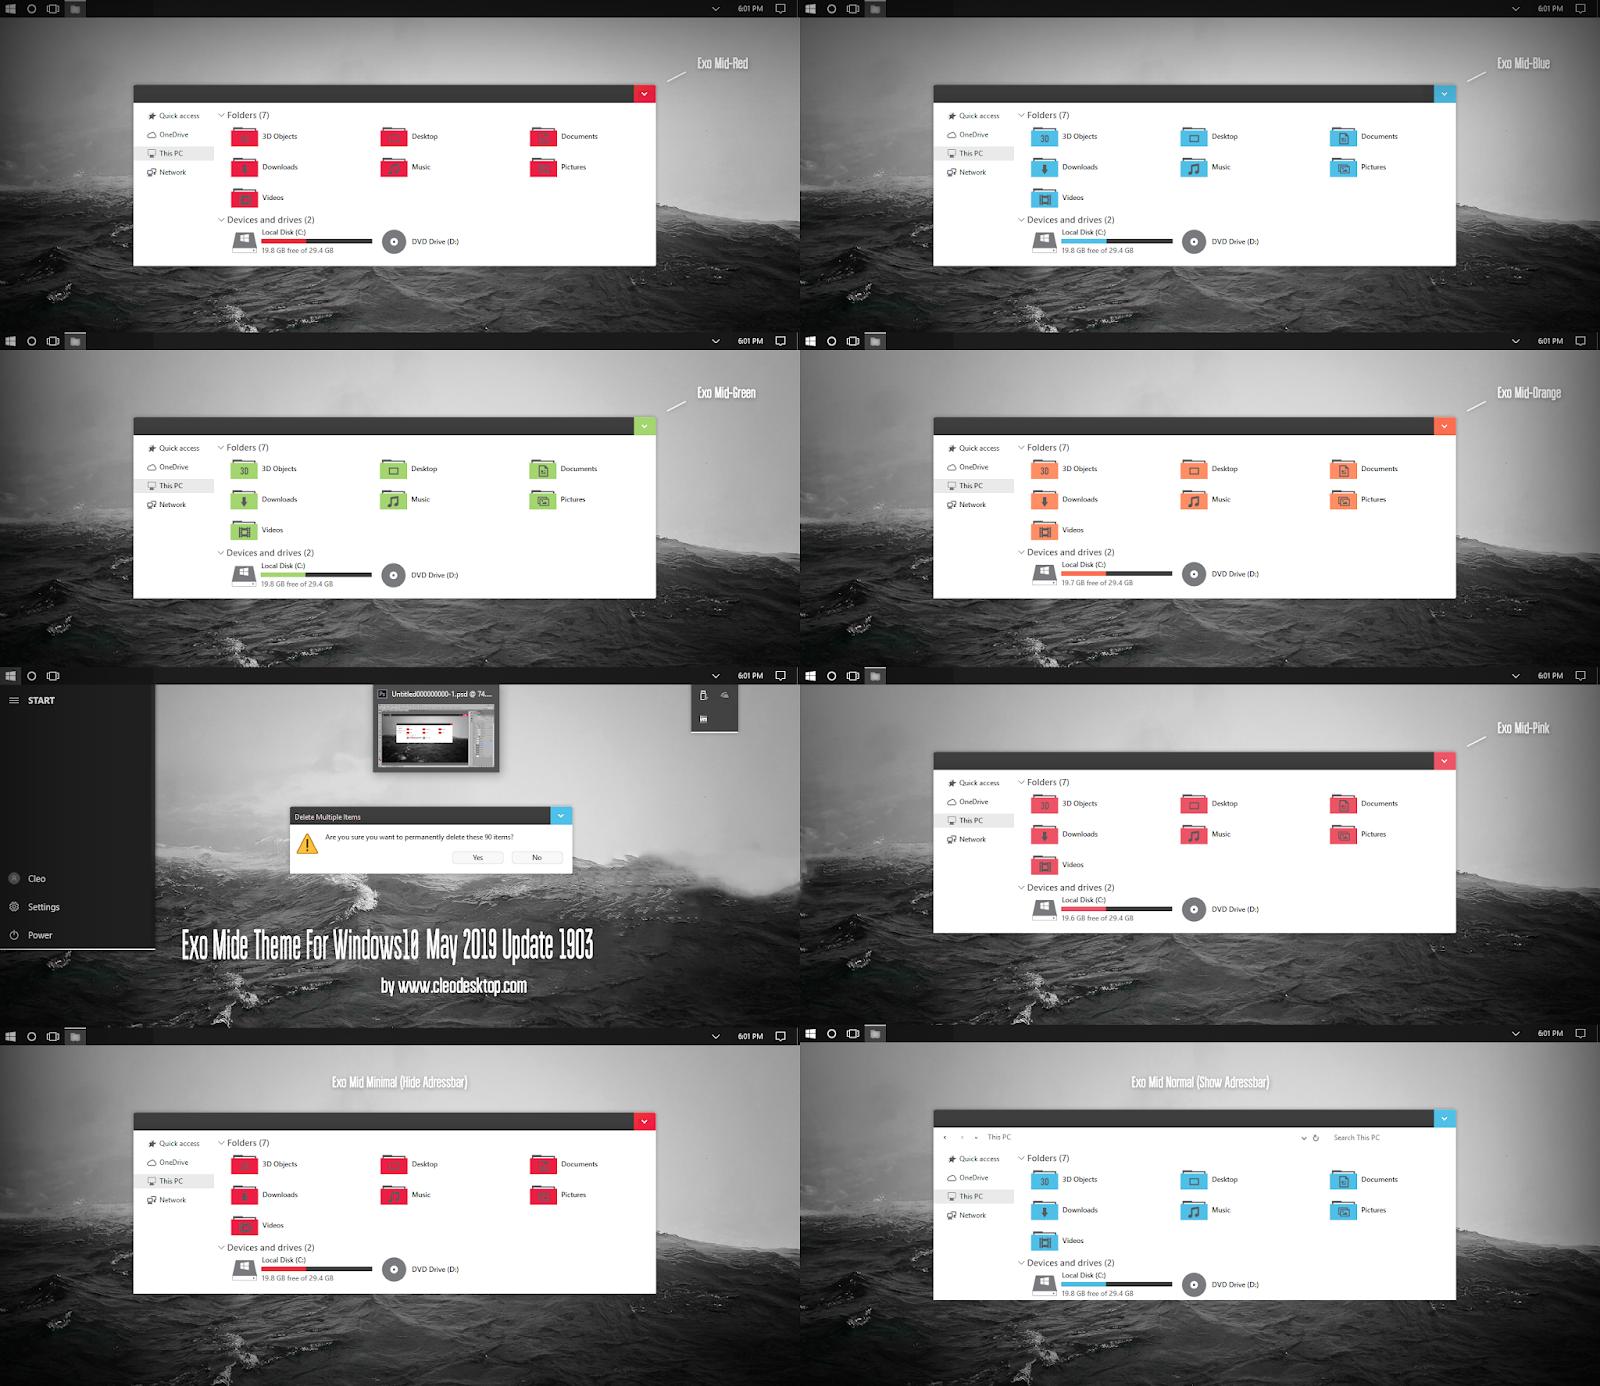 Exo Mide Theme Windows10 May 2019 Update 1903